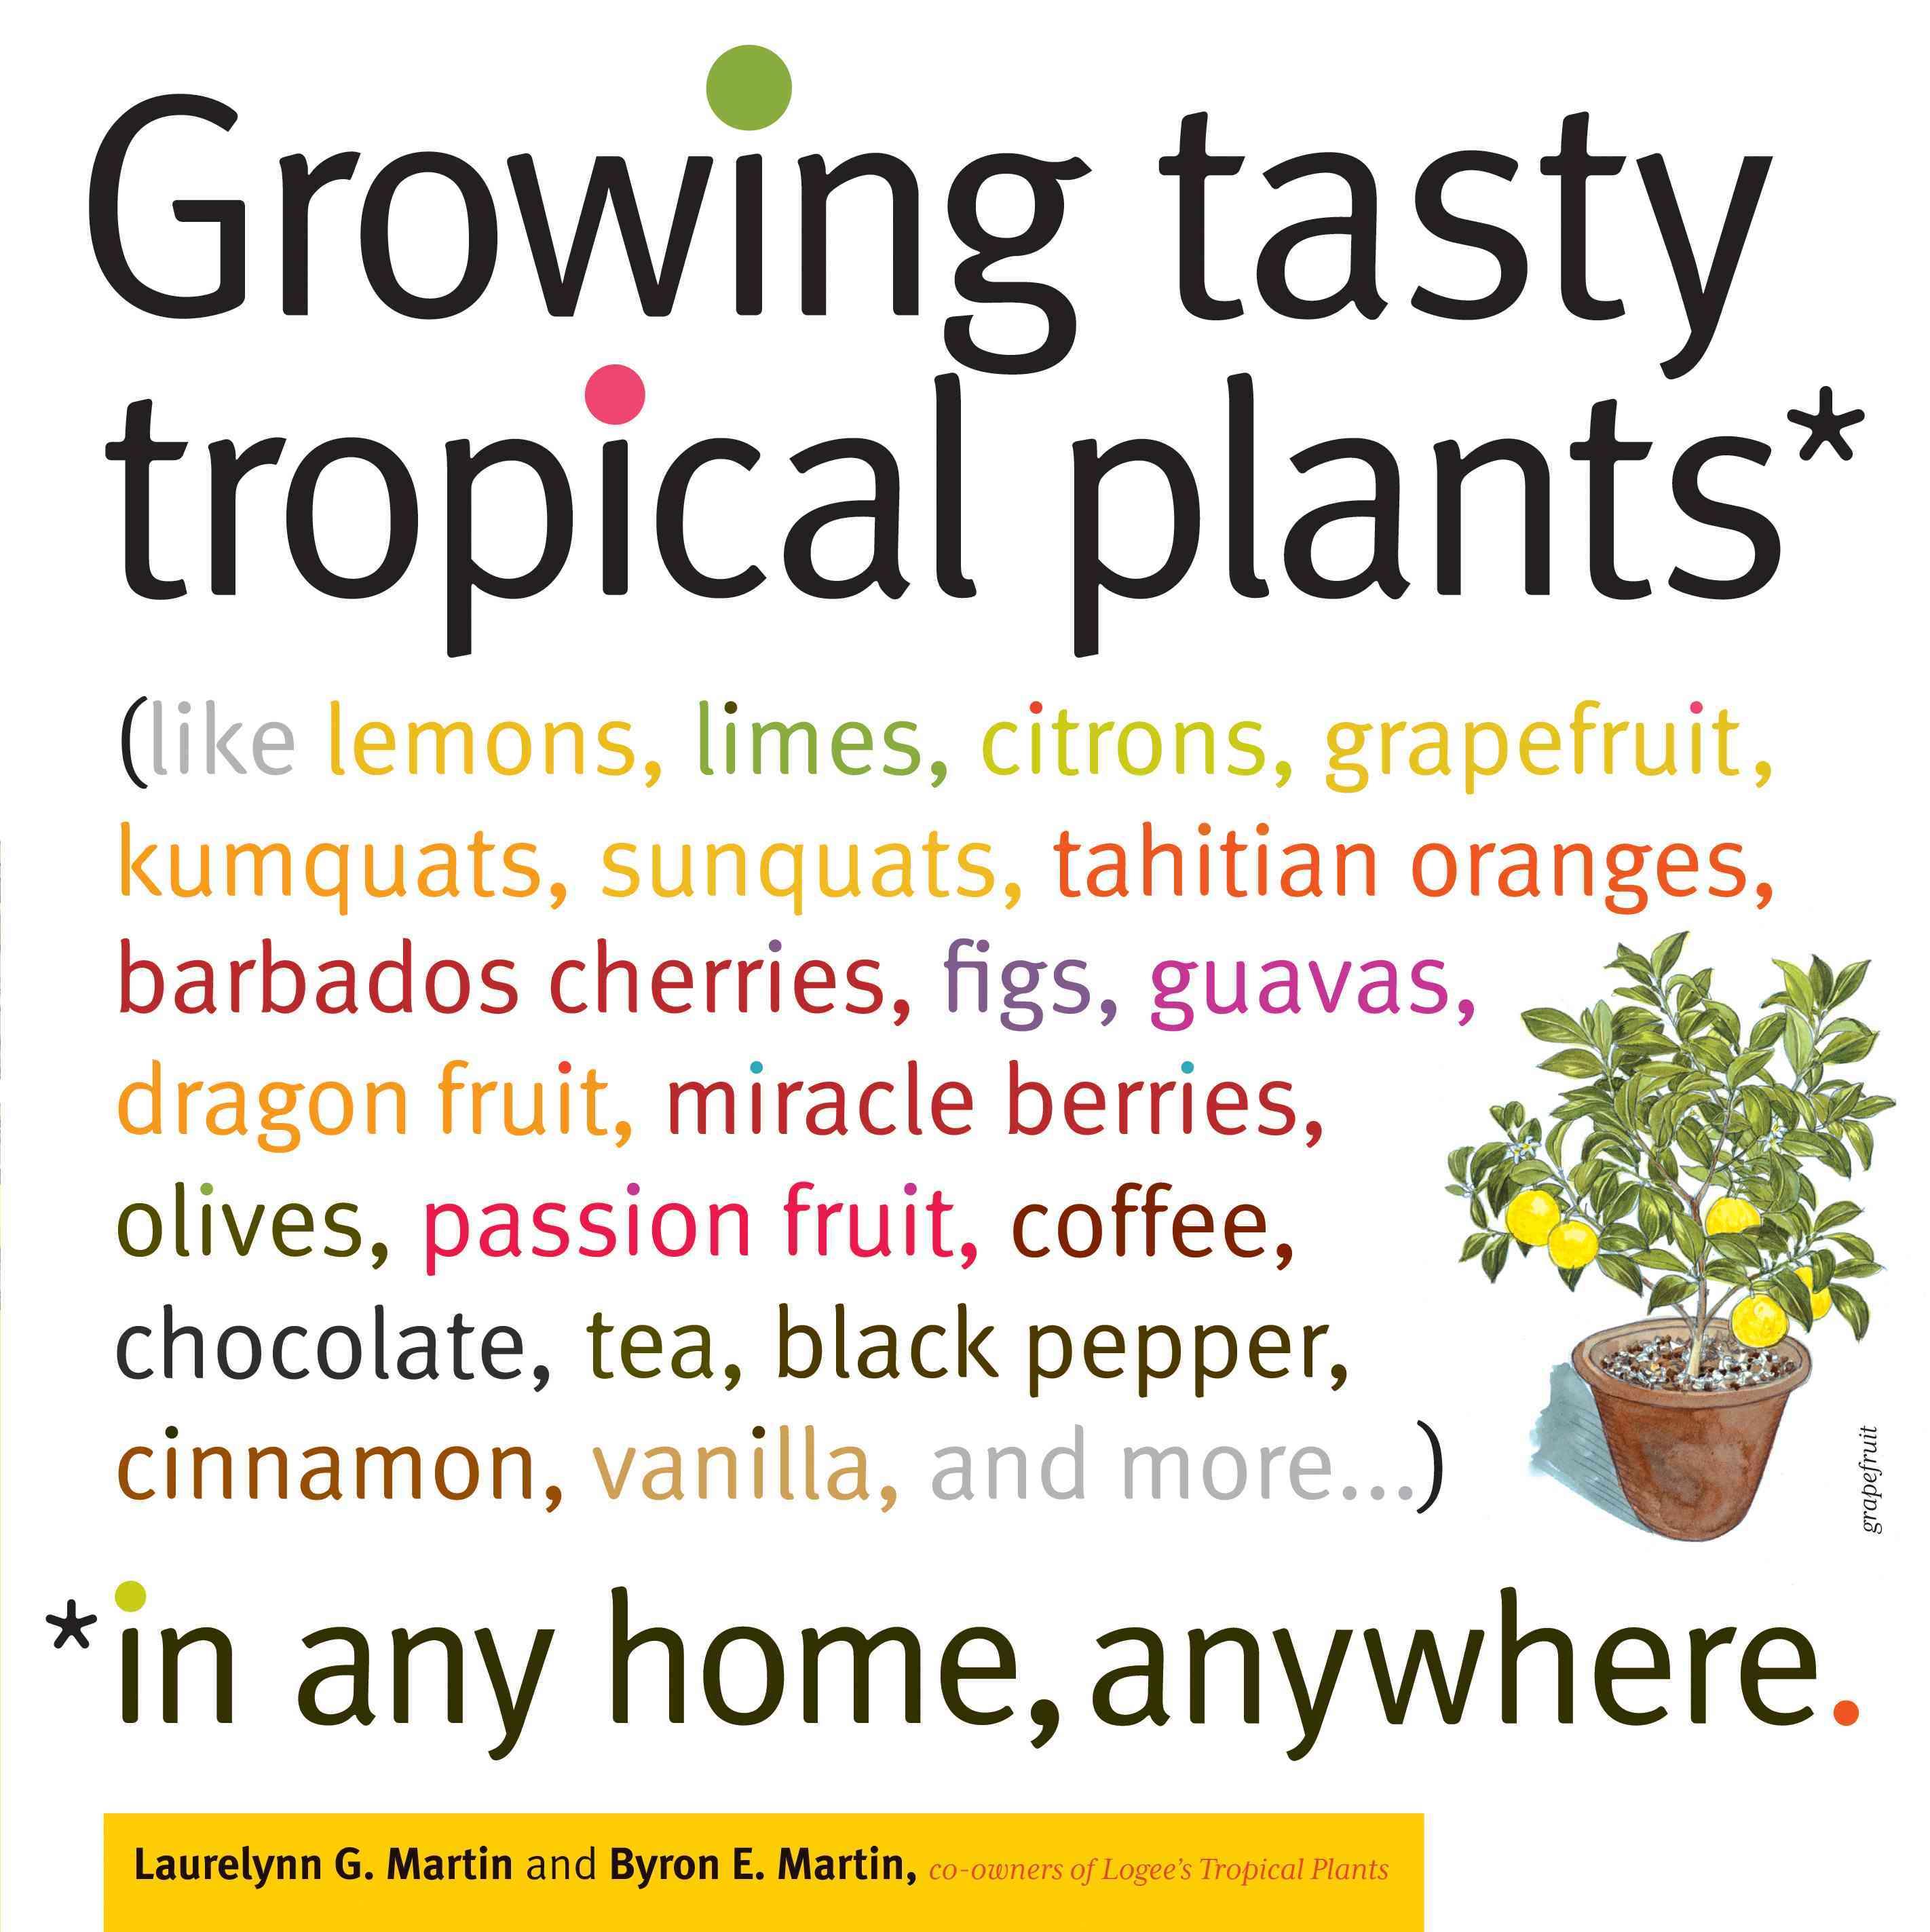 Growing Tasty Tropical Plants in Any Home, Anywhere: Like Lemons, Limes, Citrons, Grapefruit, Kumquats, Sumquats,... (Paperback)